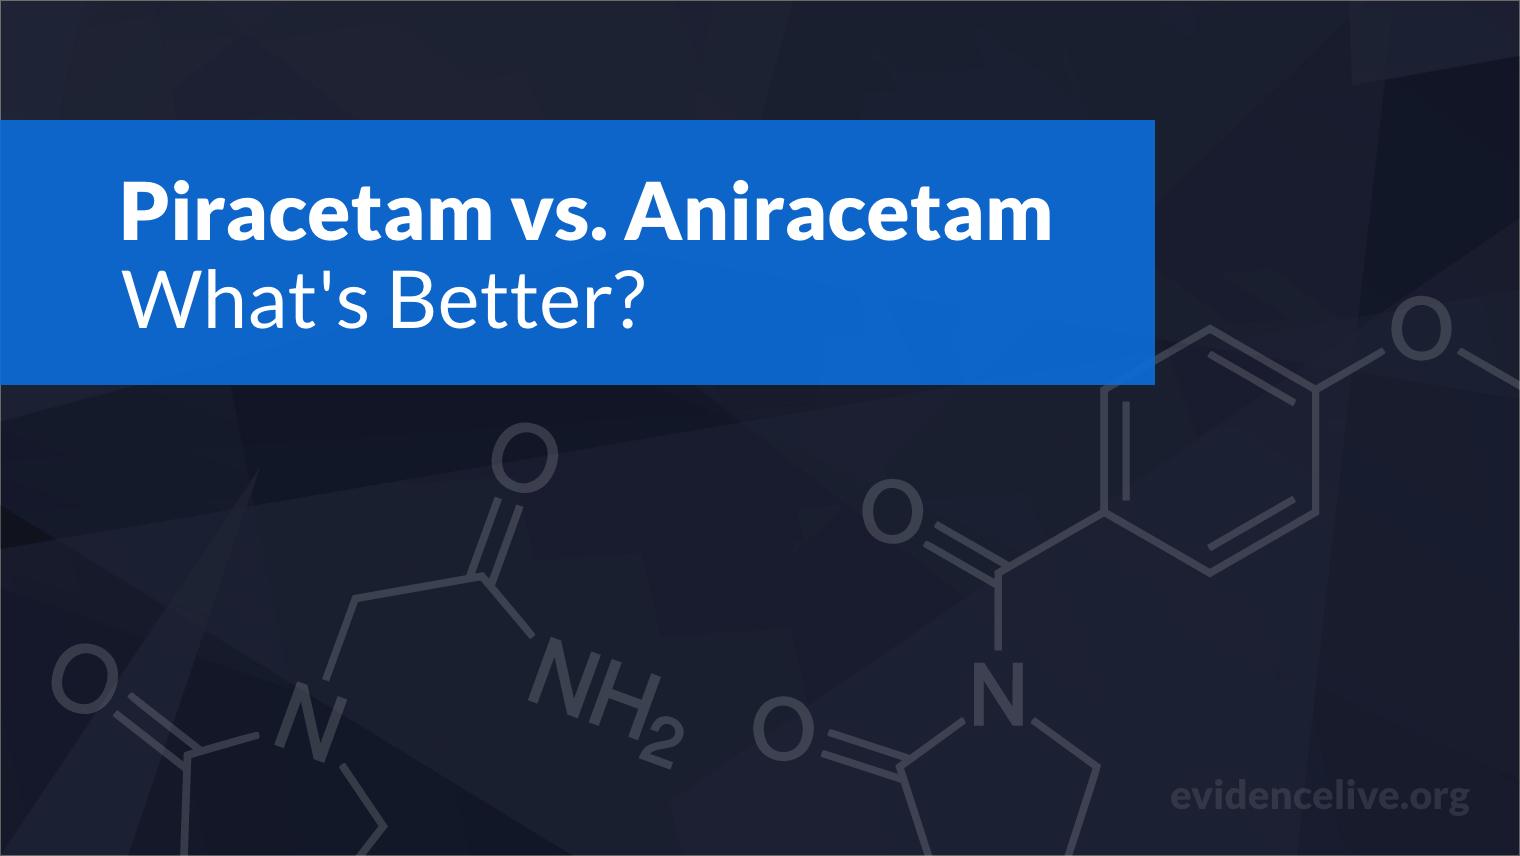 Piracetam vs. Aniracetam: Differences and What's Better